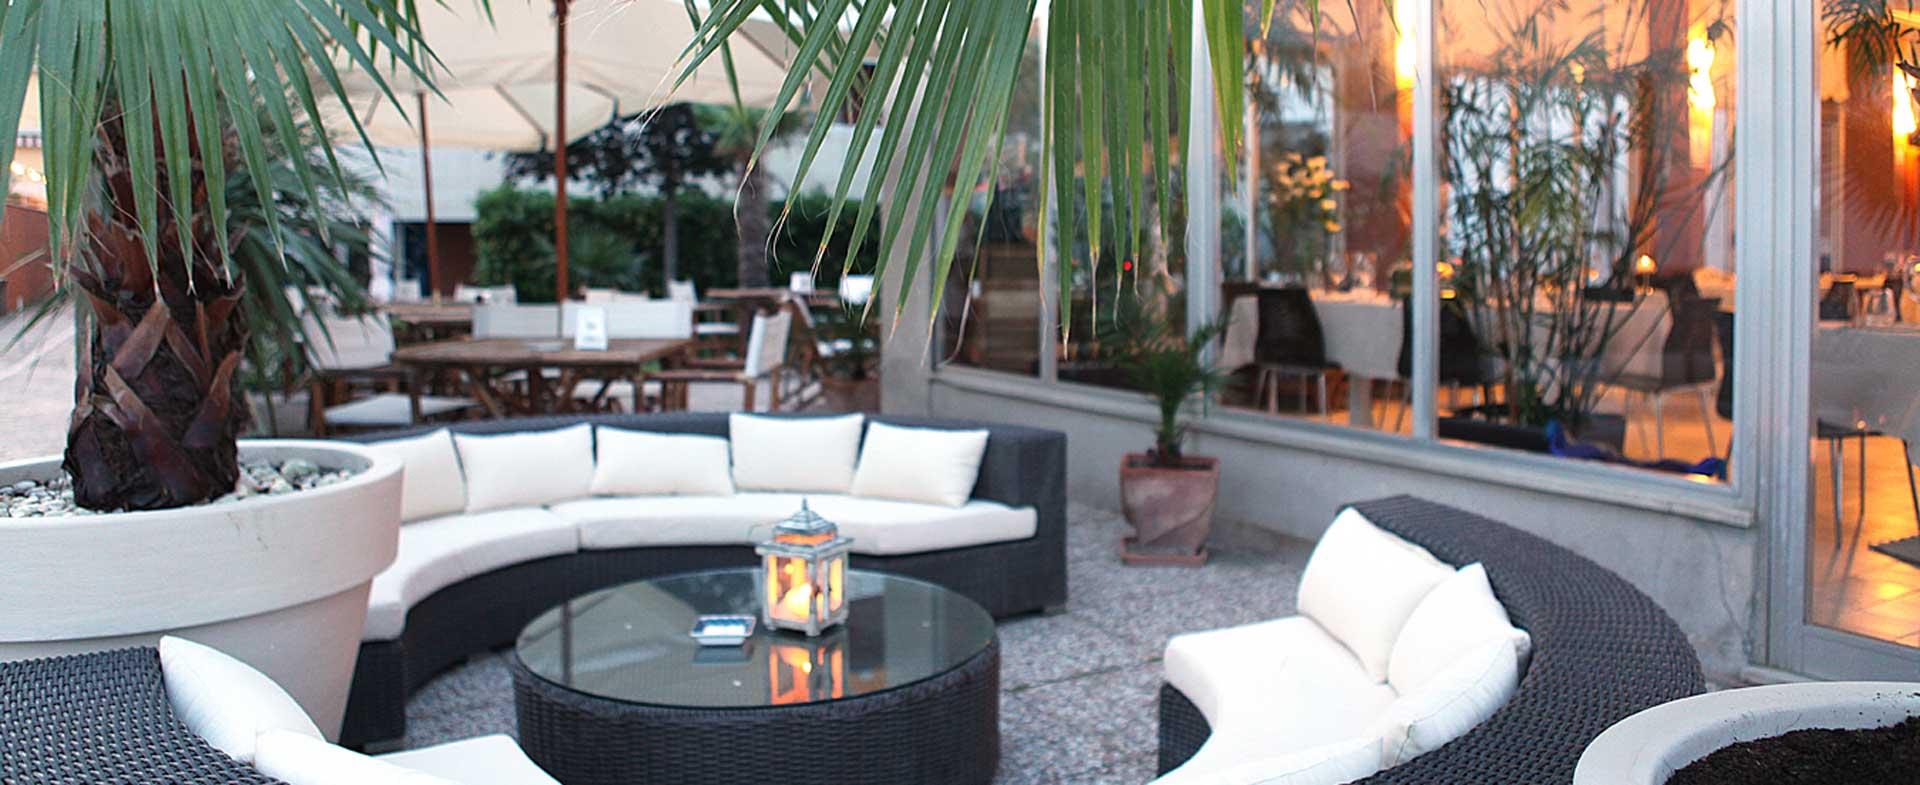 veranda_playa